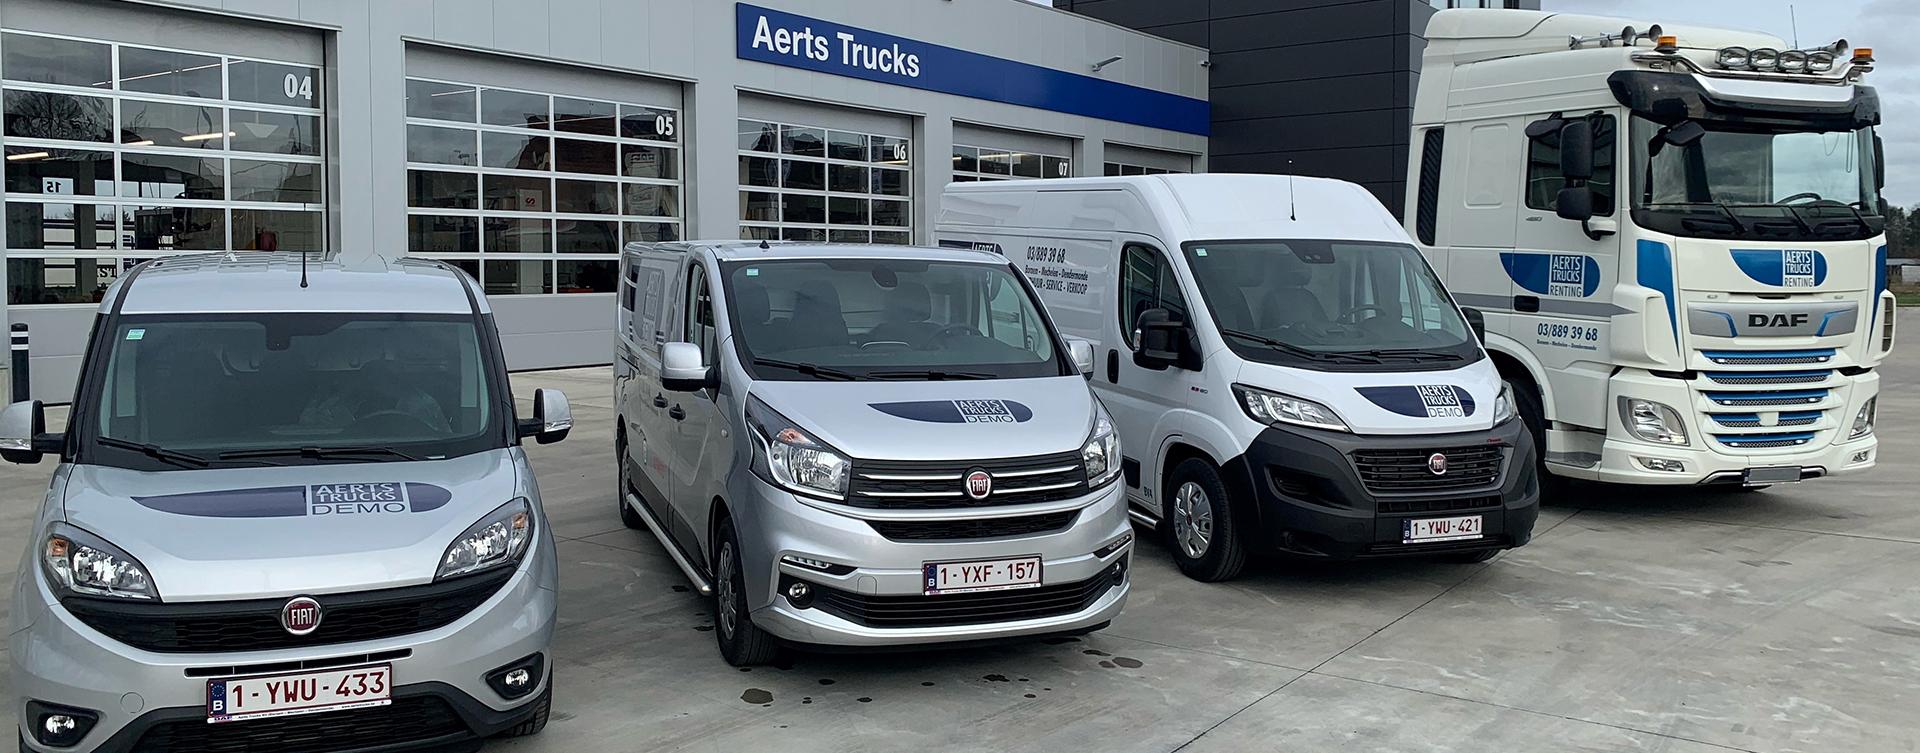 Aerts Trucks Renting